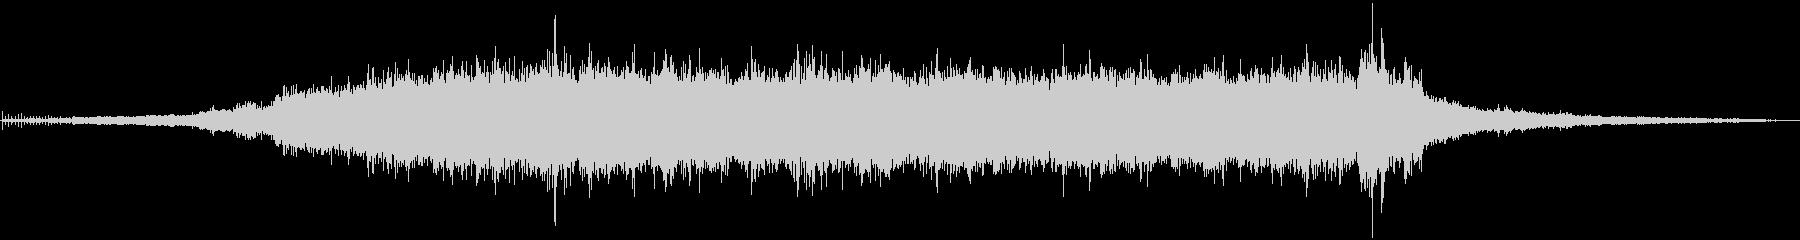 ASTAR AS350D:EXT:...の未再生の波形